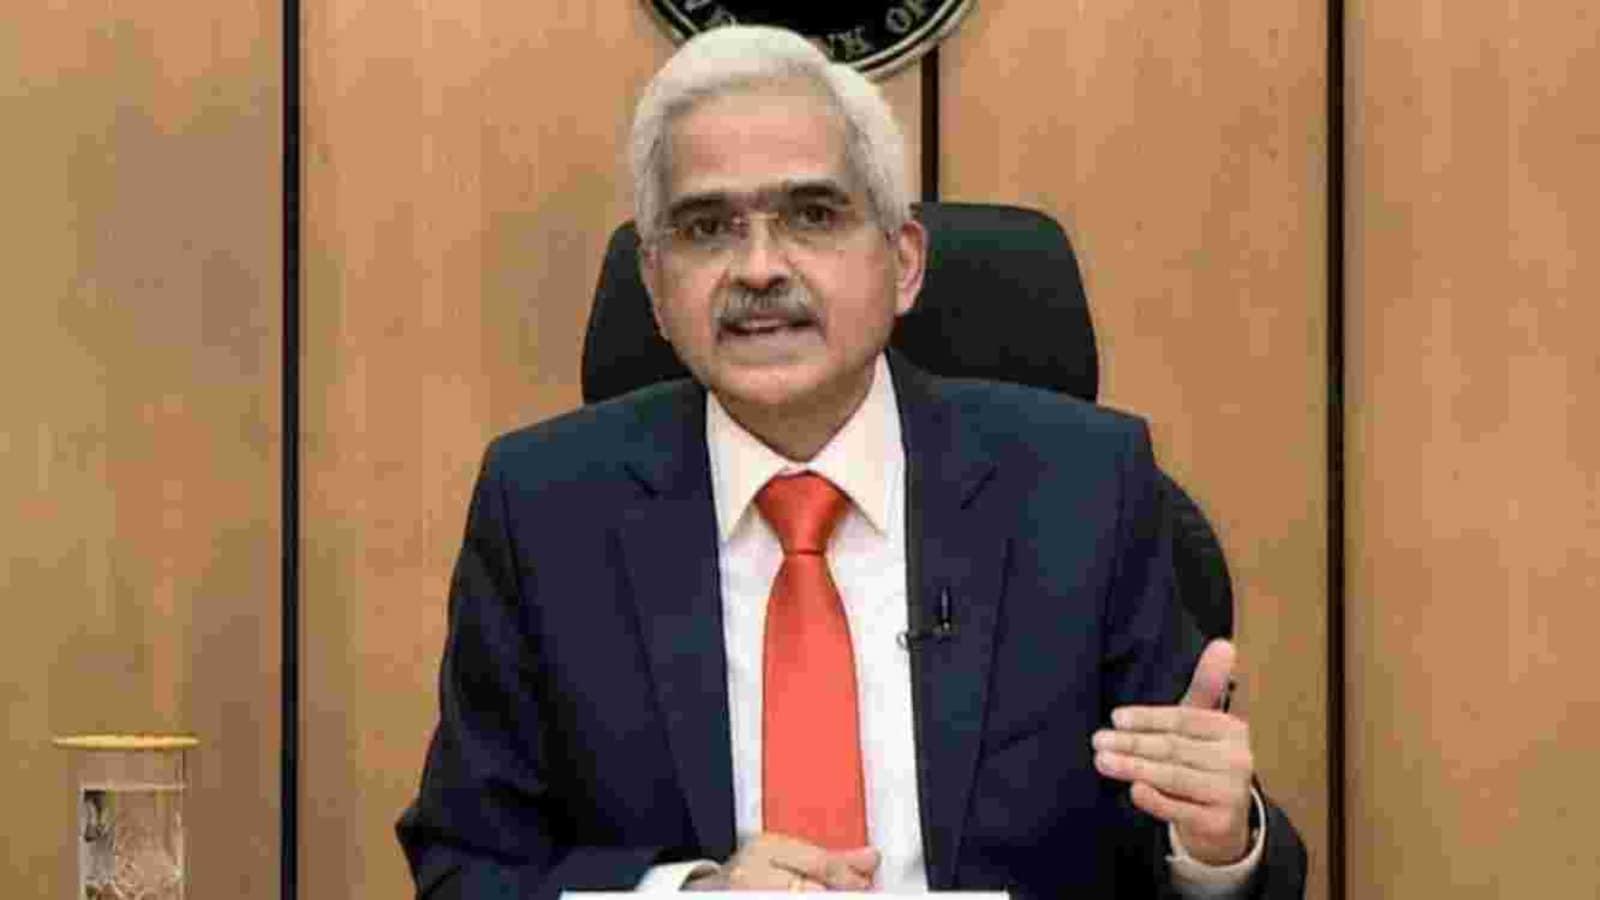 RBI has concerns about cryptocurrencies: Governor Shaktikanta Das